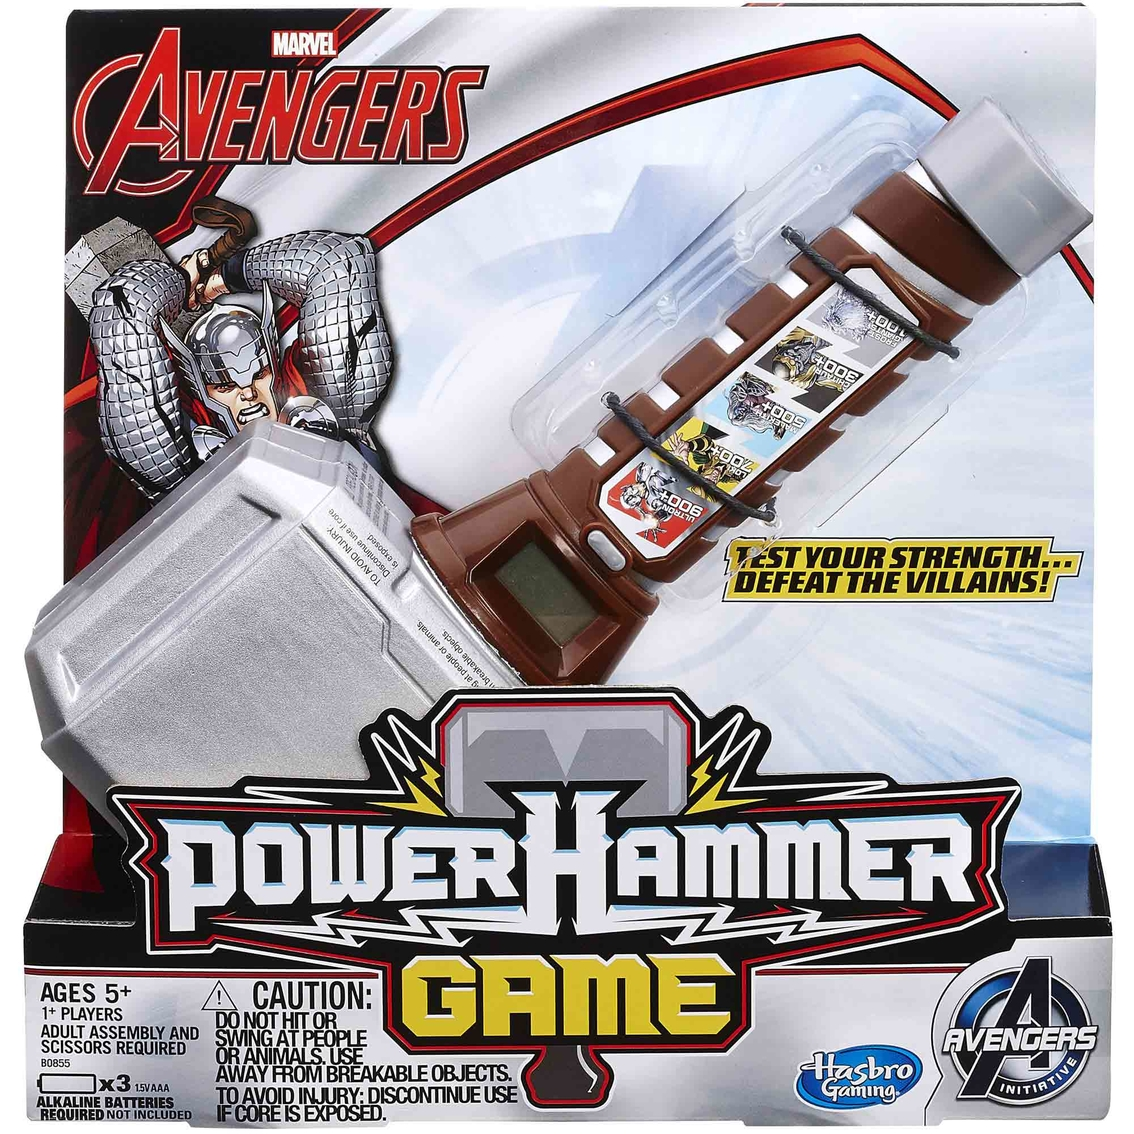 Hammer Game Toy : Marvel avengers thor s power hammer game games baby